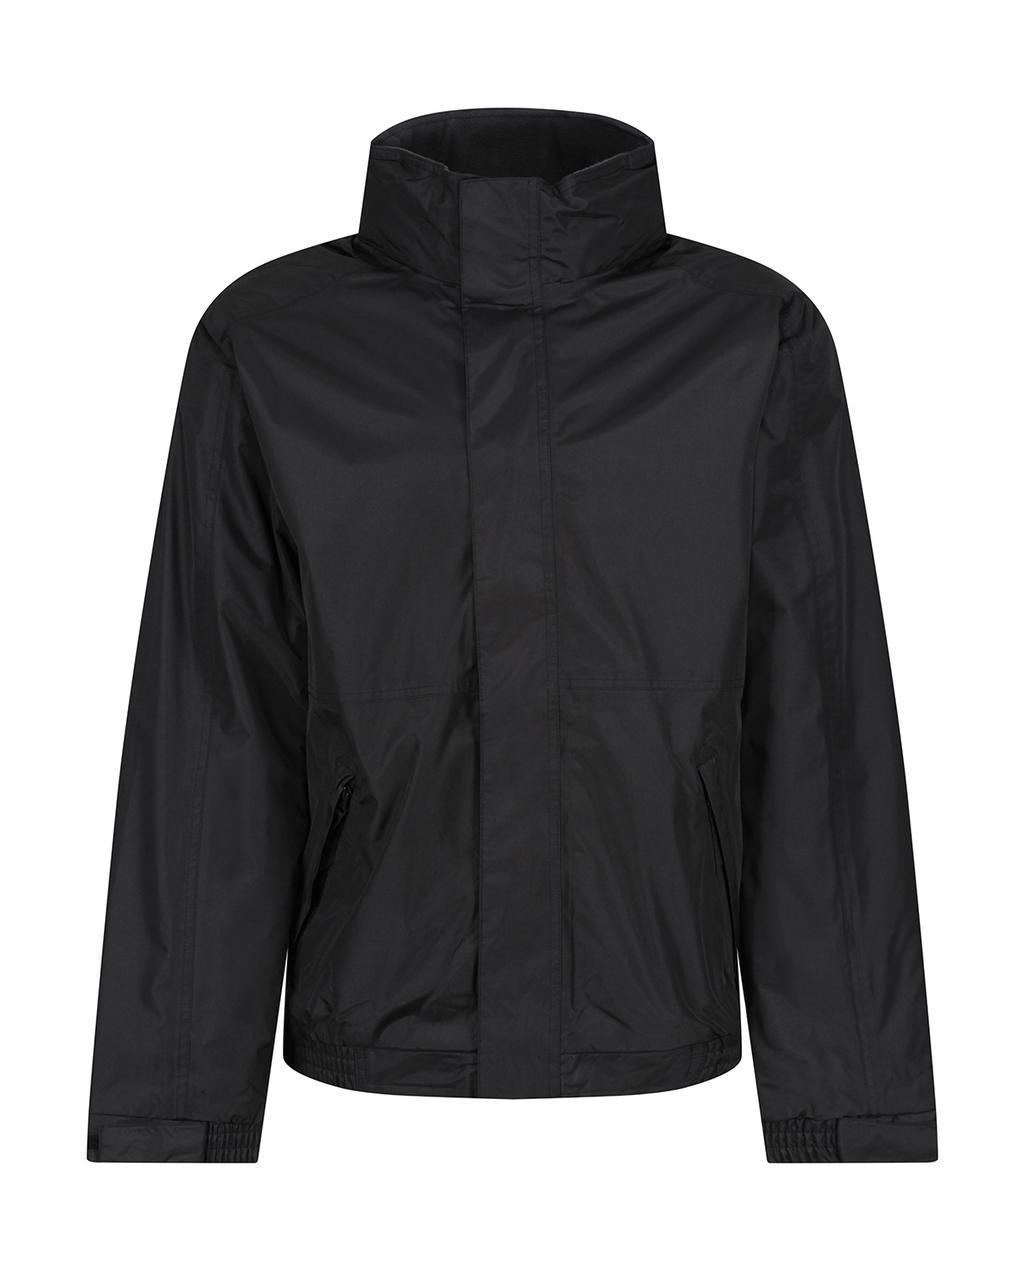 Eco Dover Jacket